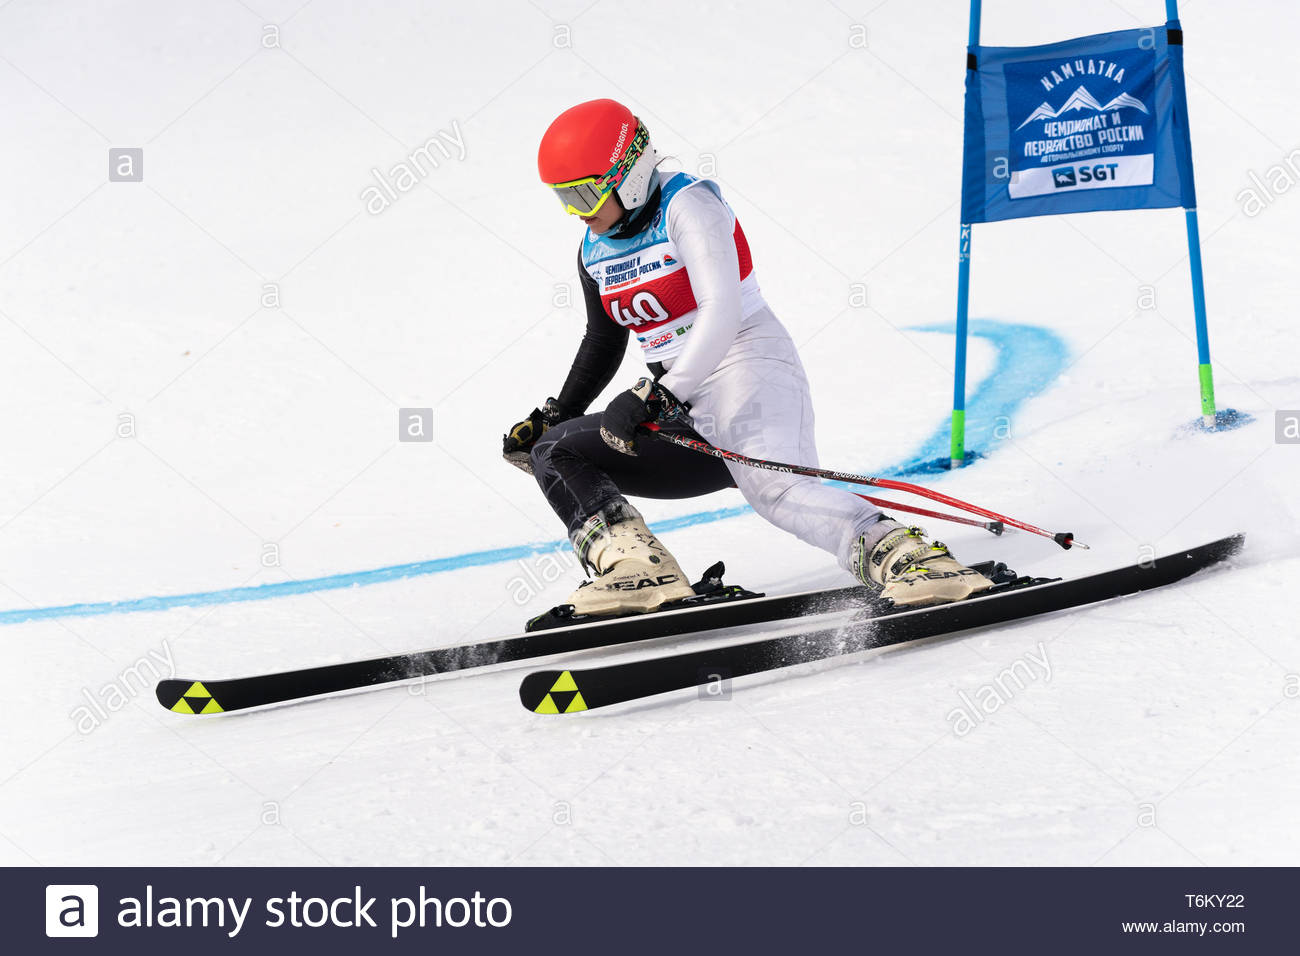 KAMCHATKA, RUSSIA - APRIL 2, 2019: Russian Women's Alpine Skiing Cup, International Ski Federation Championship - giant slalom. Mountain skier Ekateri - Stock Image